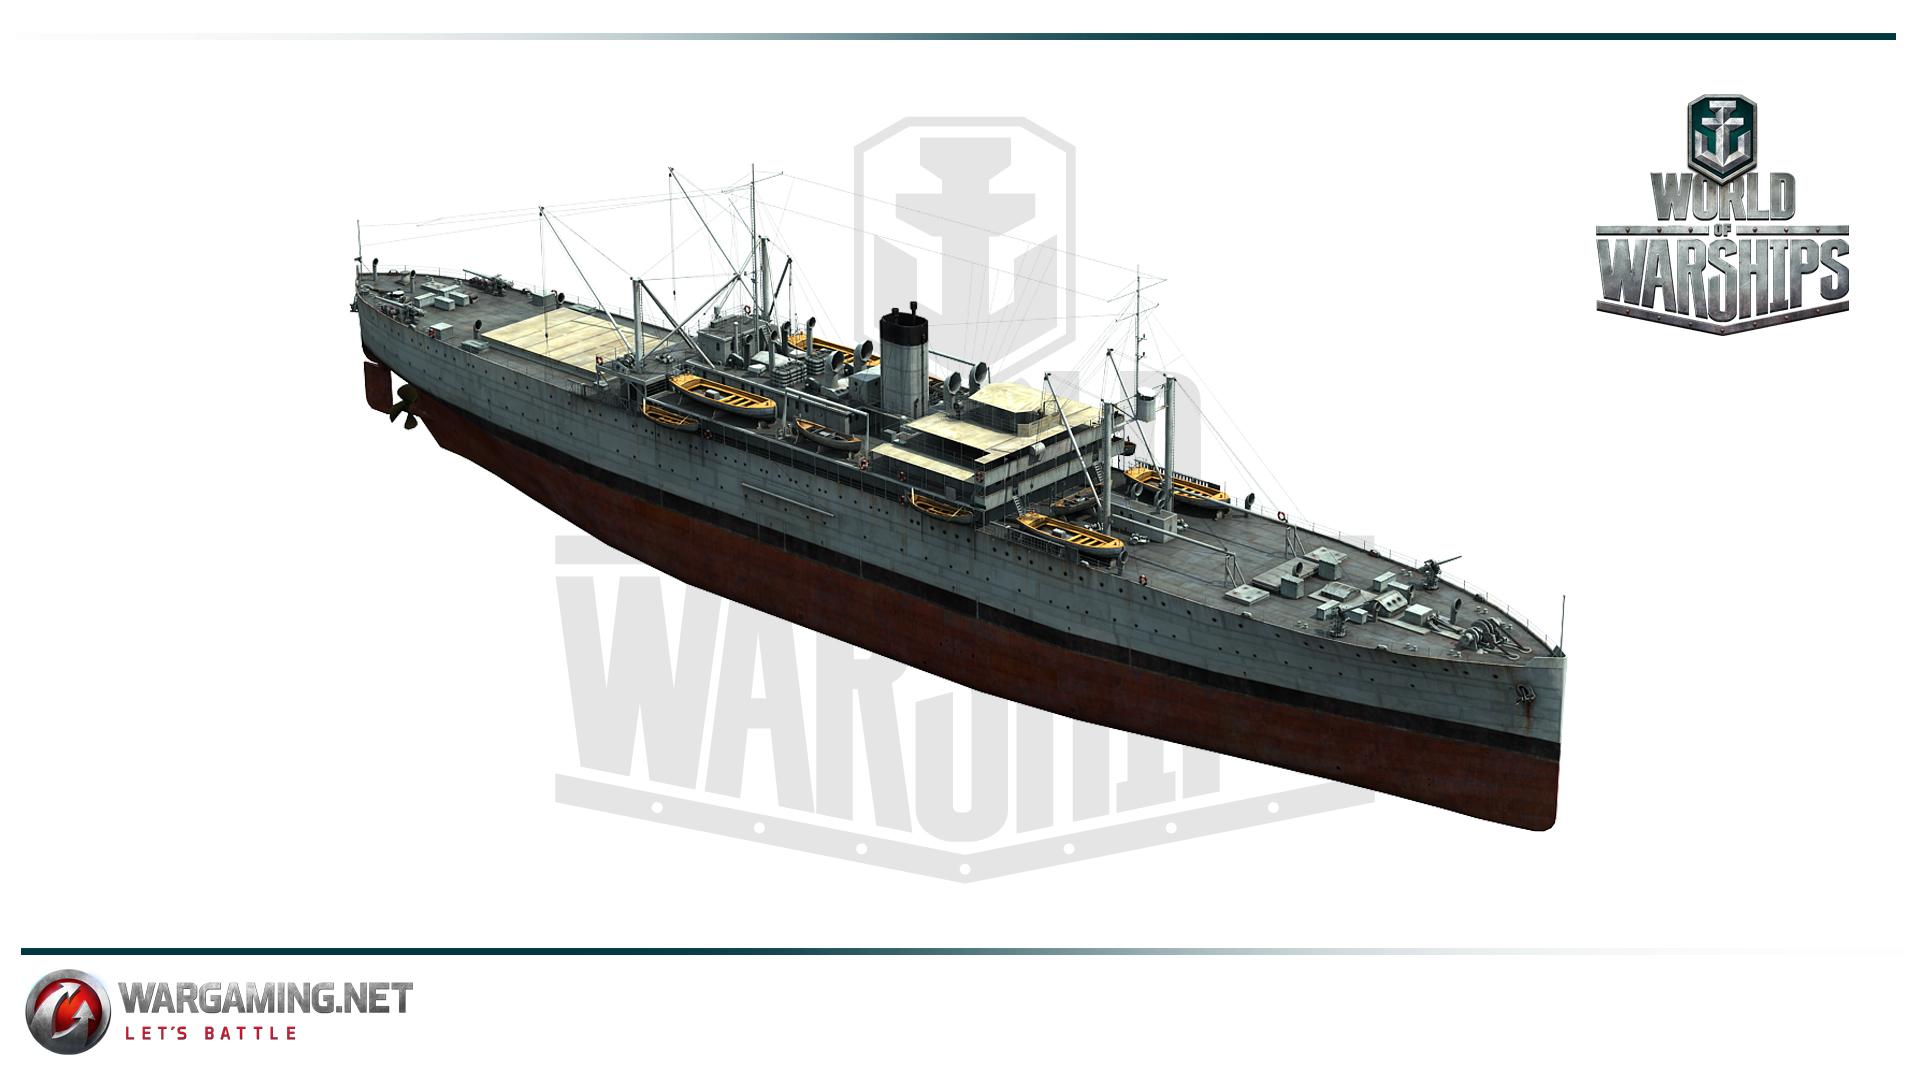 Carousel_USS_Wright.jpg